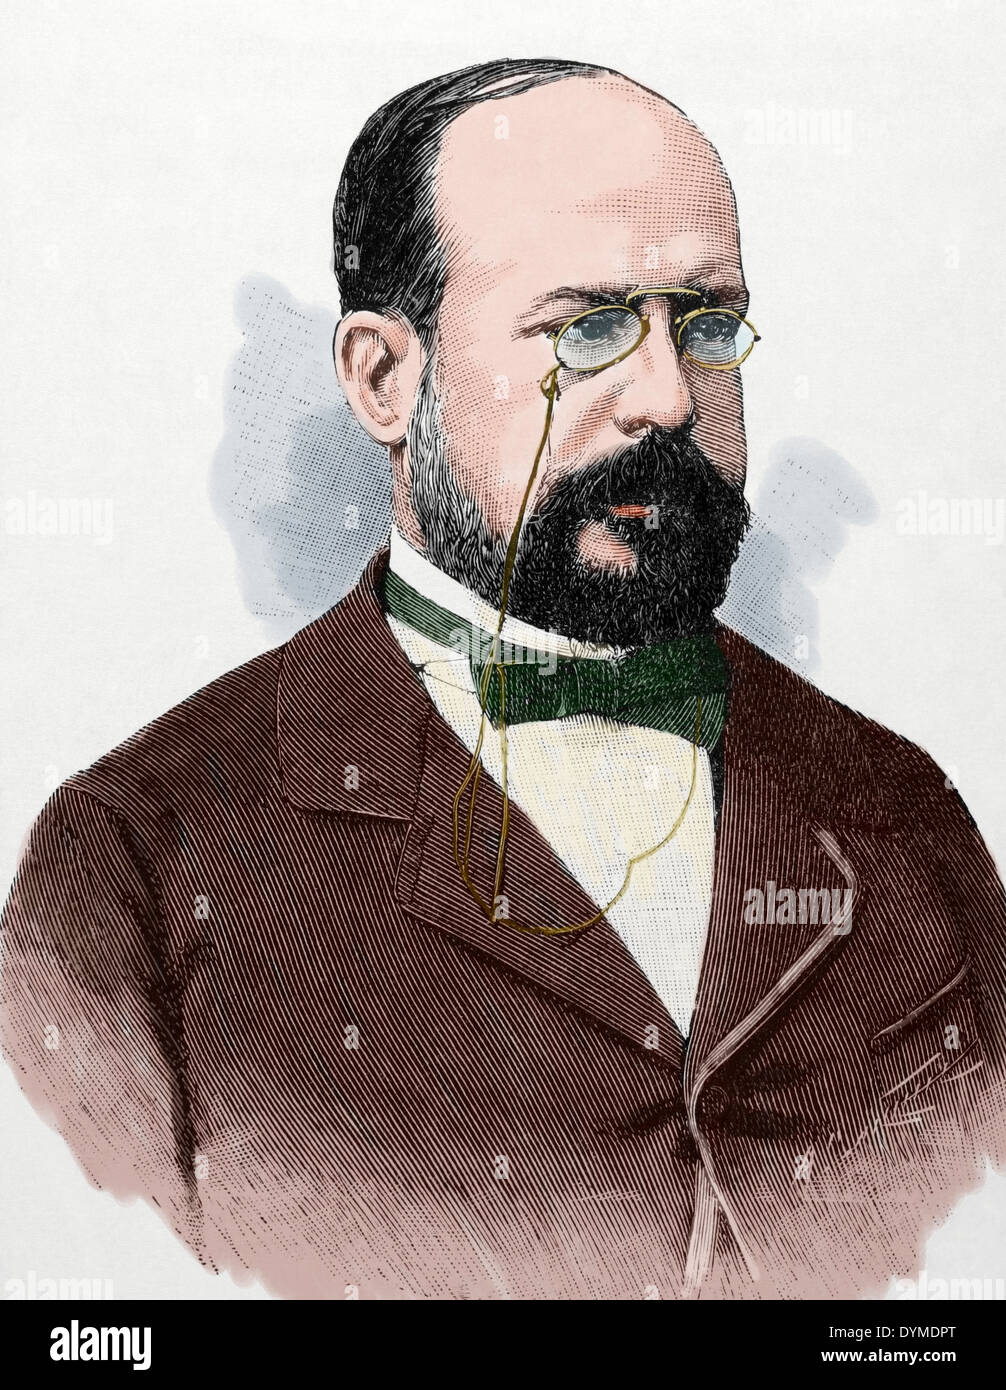 Eduardo Leon y Ortiz (19. Jahrhundert). Spanisch-Professorin an der Fakultät der Universidad Central. Farbige Stockbild